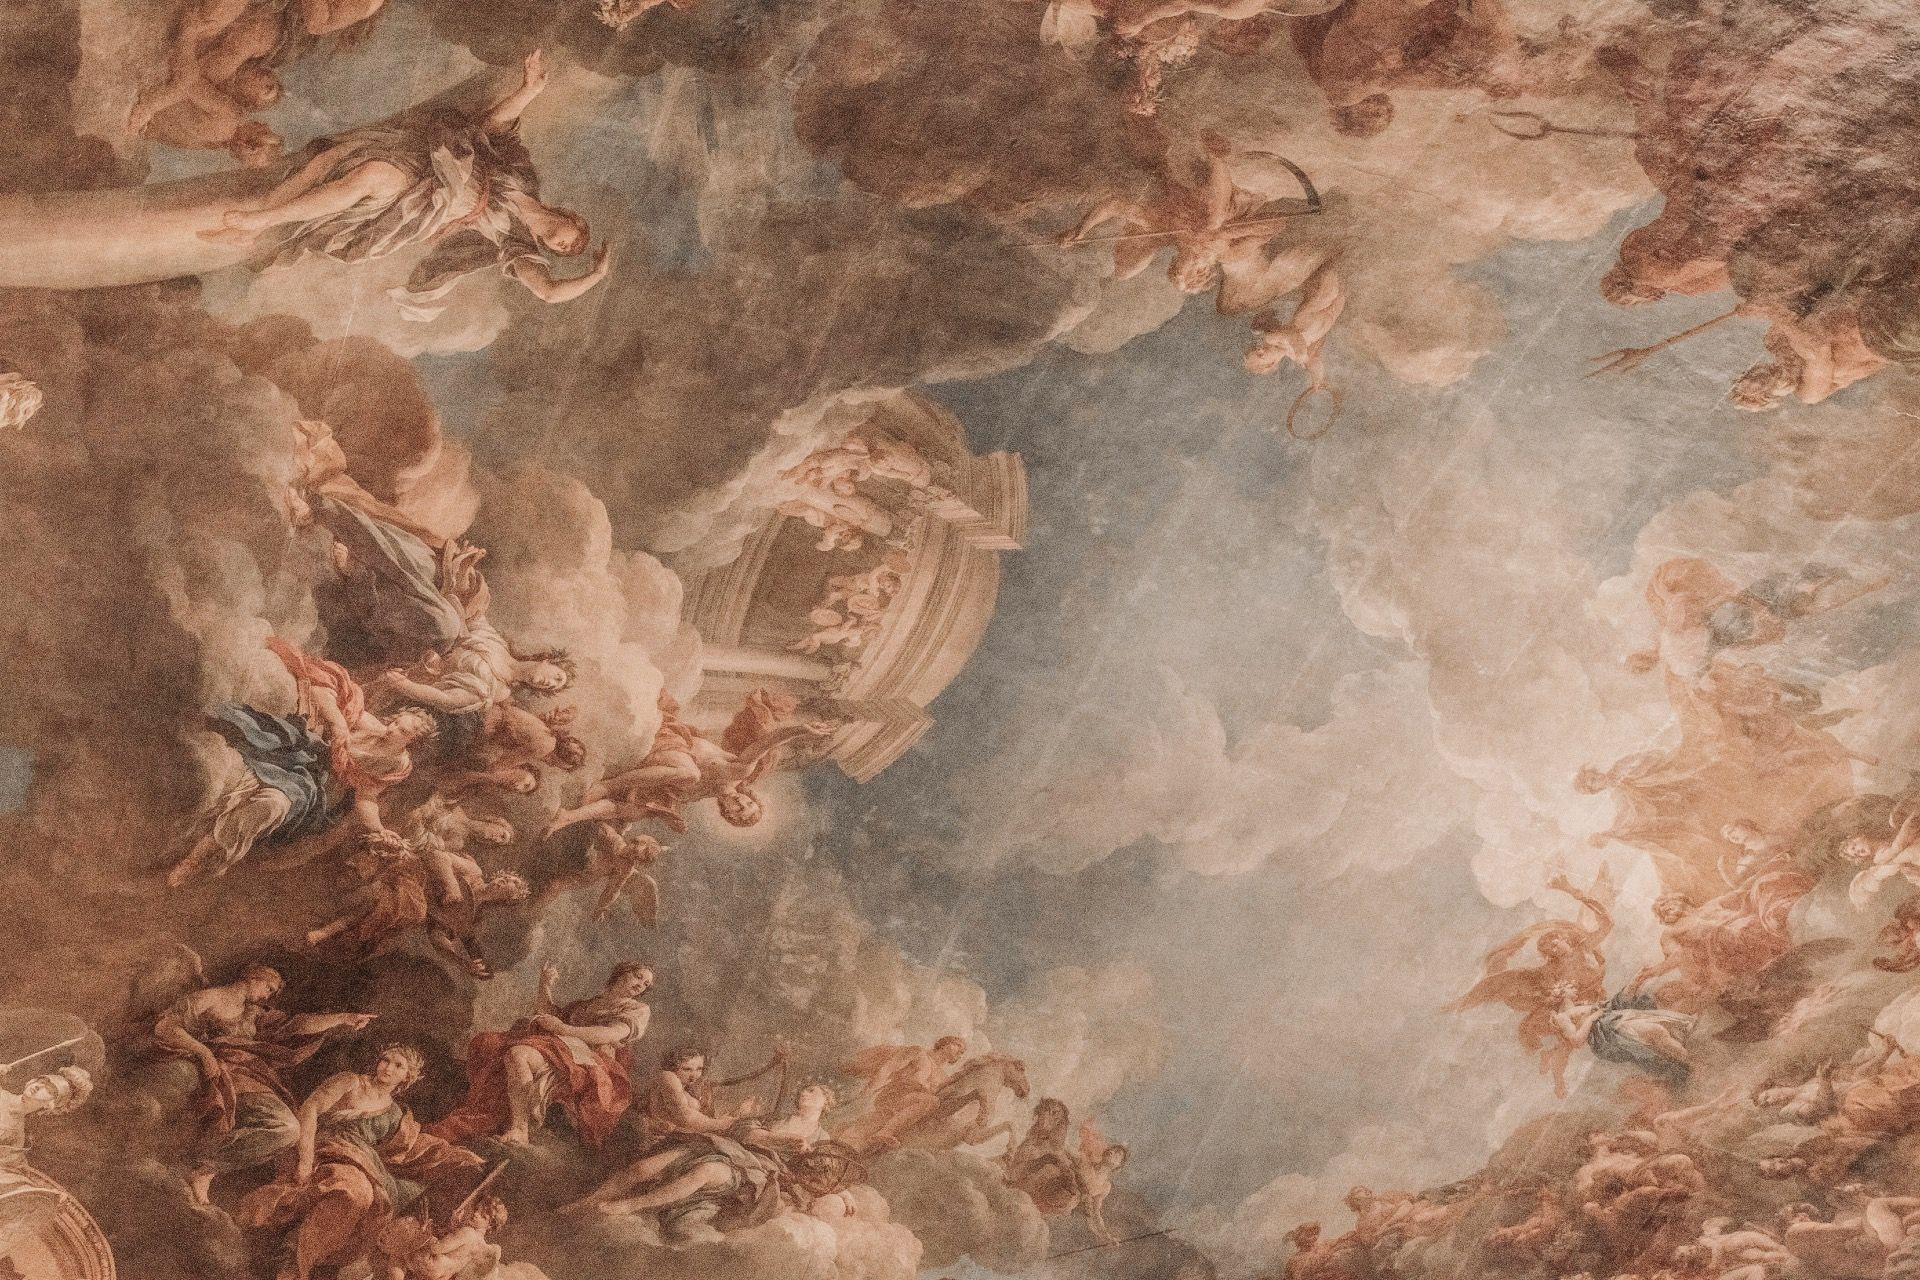 The walls are so beautiful Roman painting Renaissance art 1920x1280